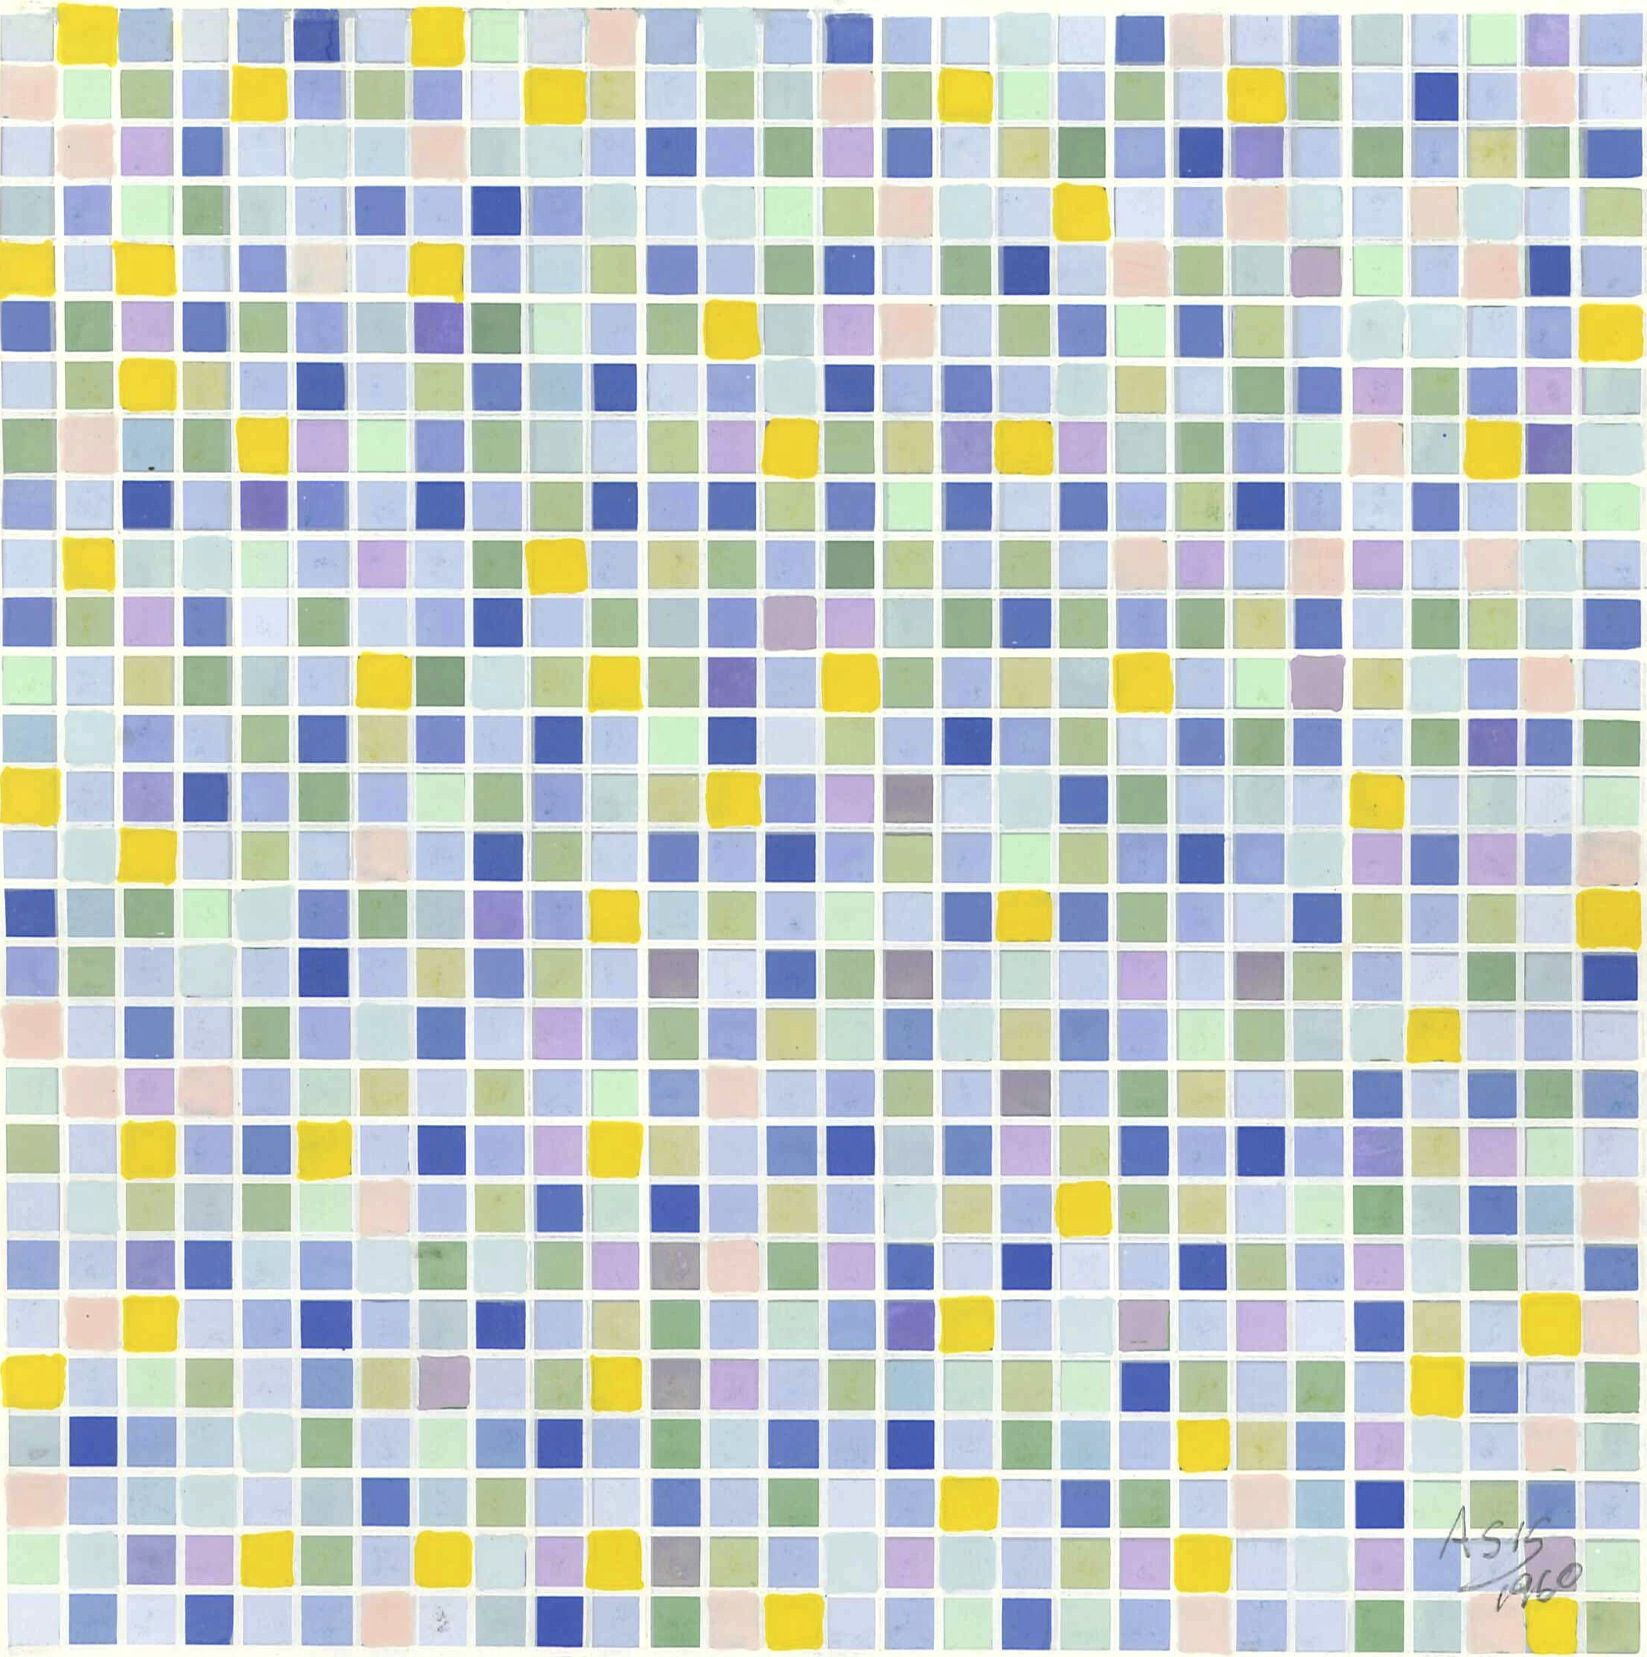 Antonio Asis,Untitled, 1960, Gouache on paper,8 7/8 x 6 7/8 in. (22.5 x 17.5 cm.)